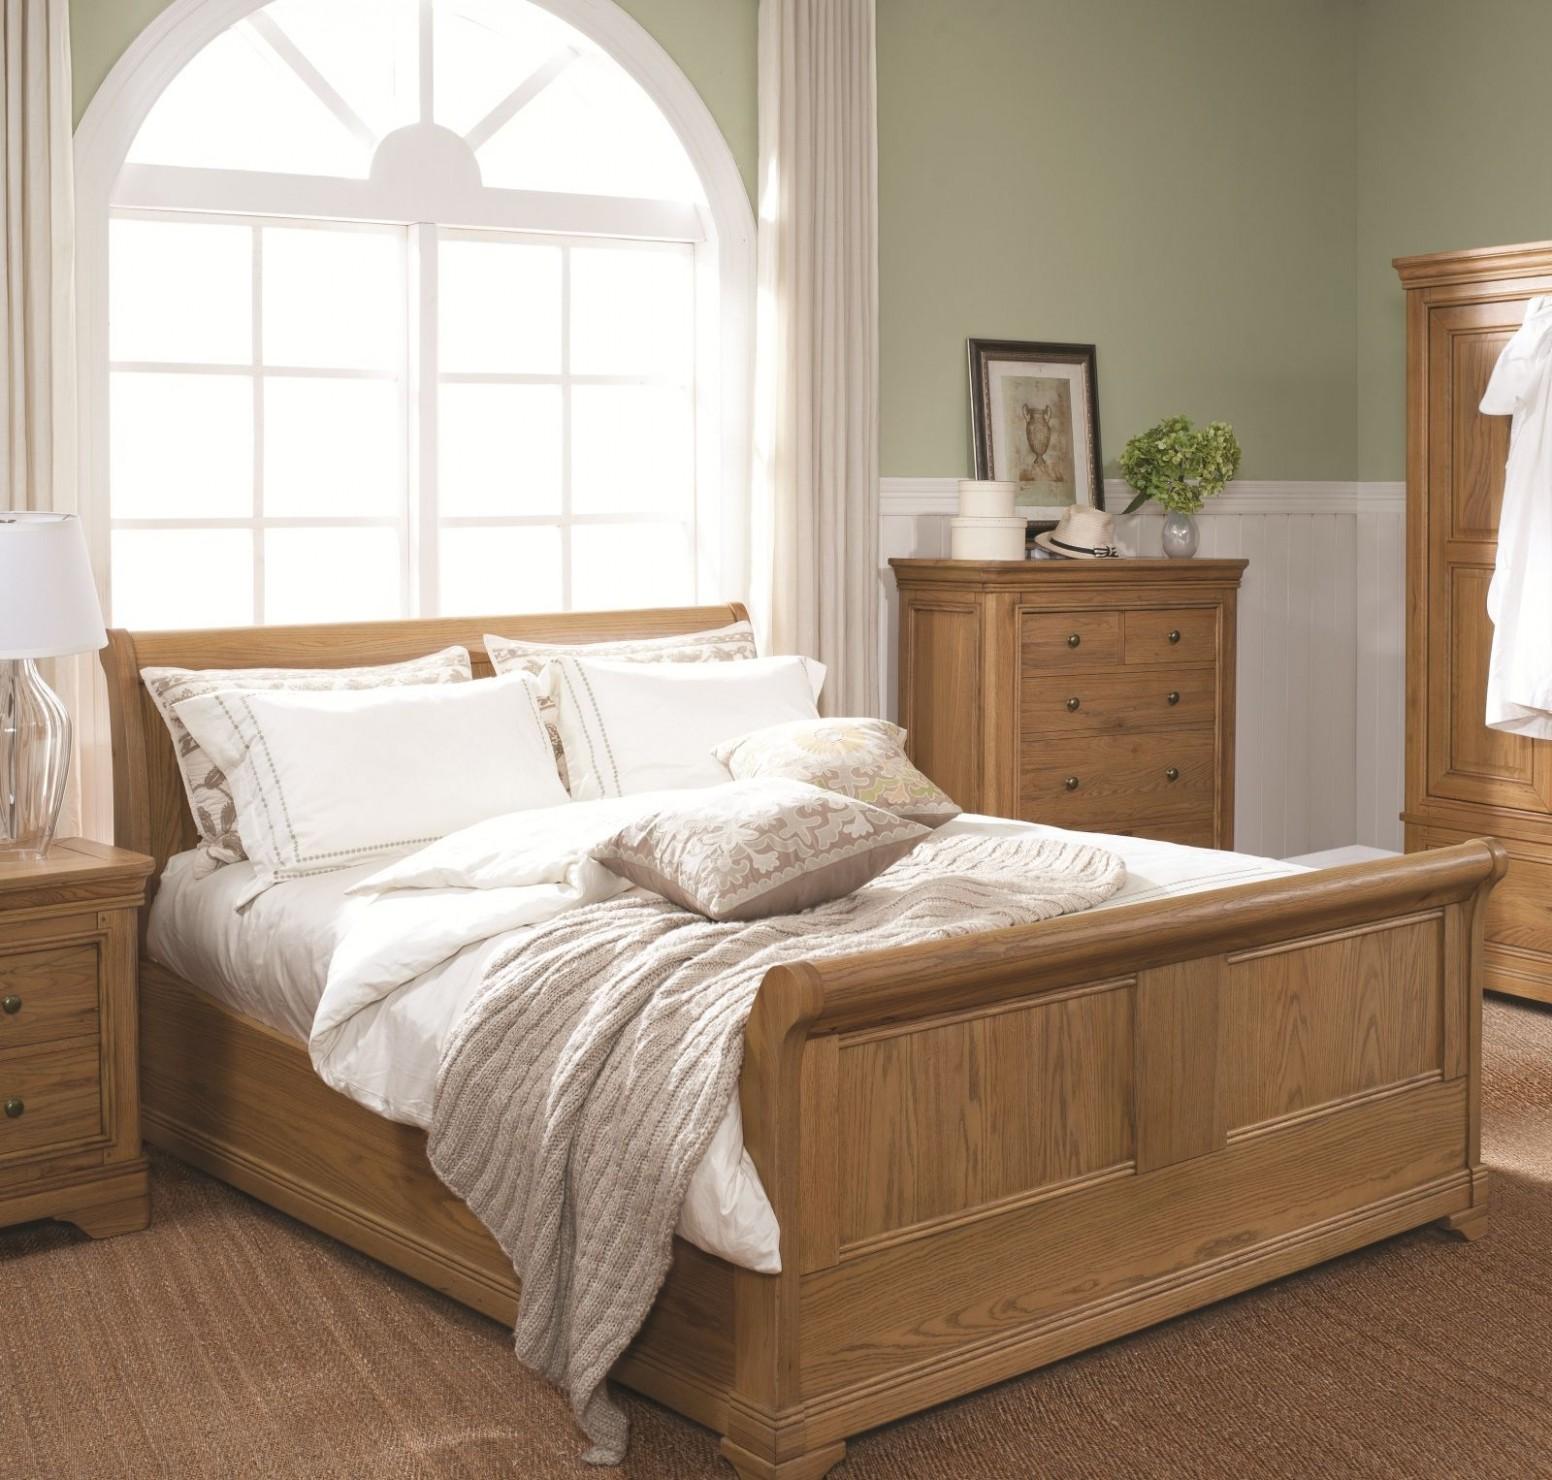 Solid Wood Bedroom Furniture Modern and Traditional Design  - Bedroom Ideas Oak Furniture